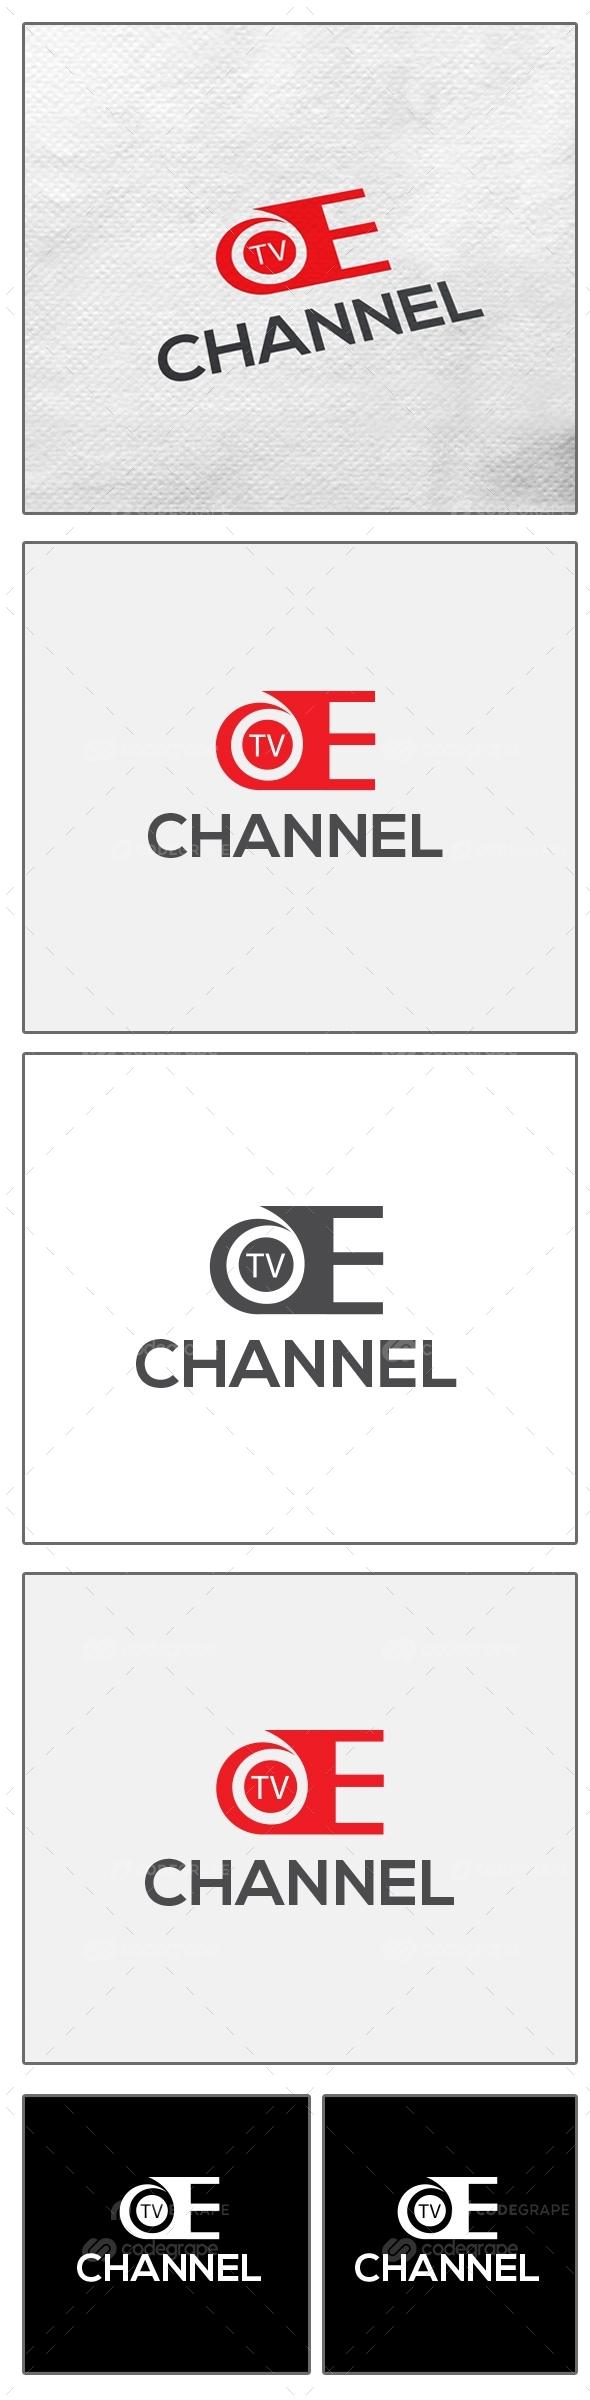 6E Channel Logo